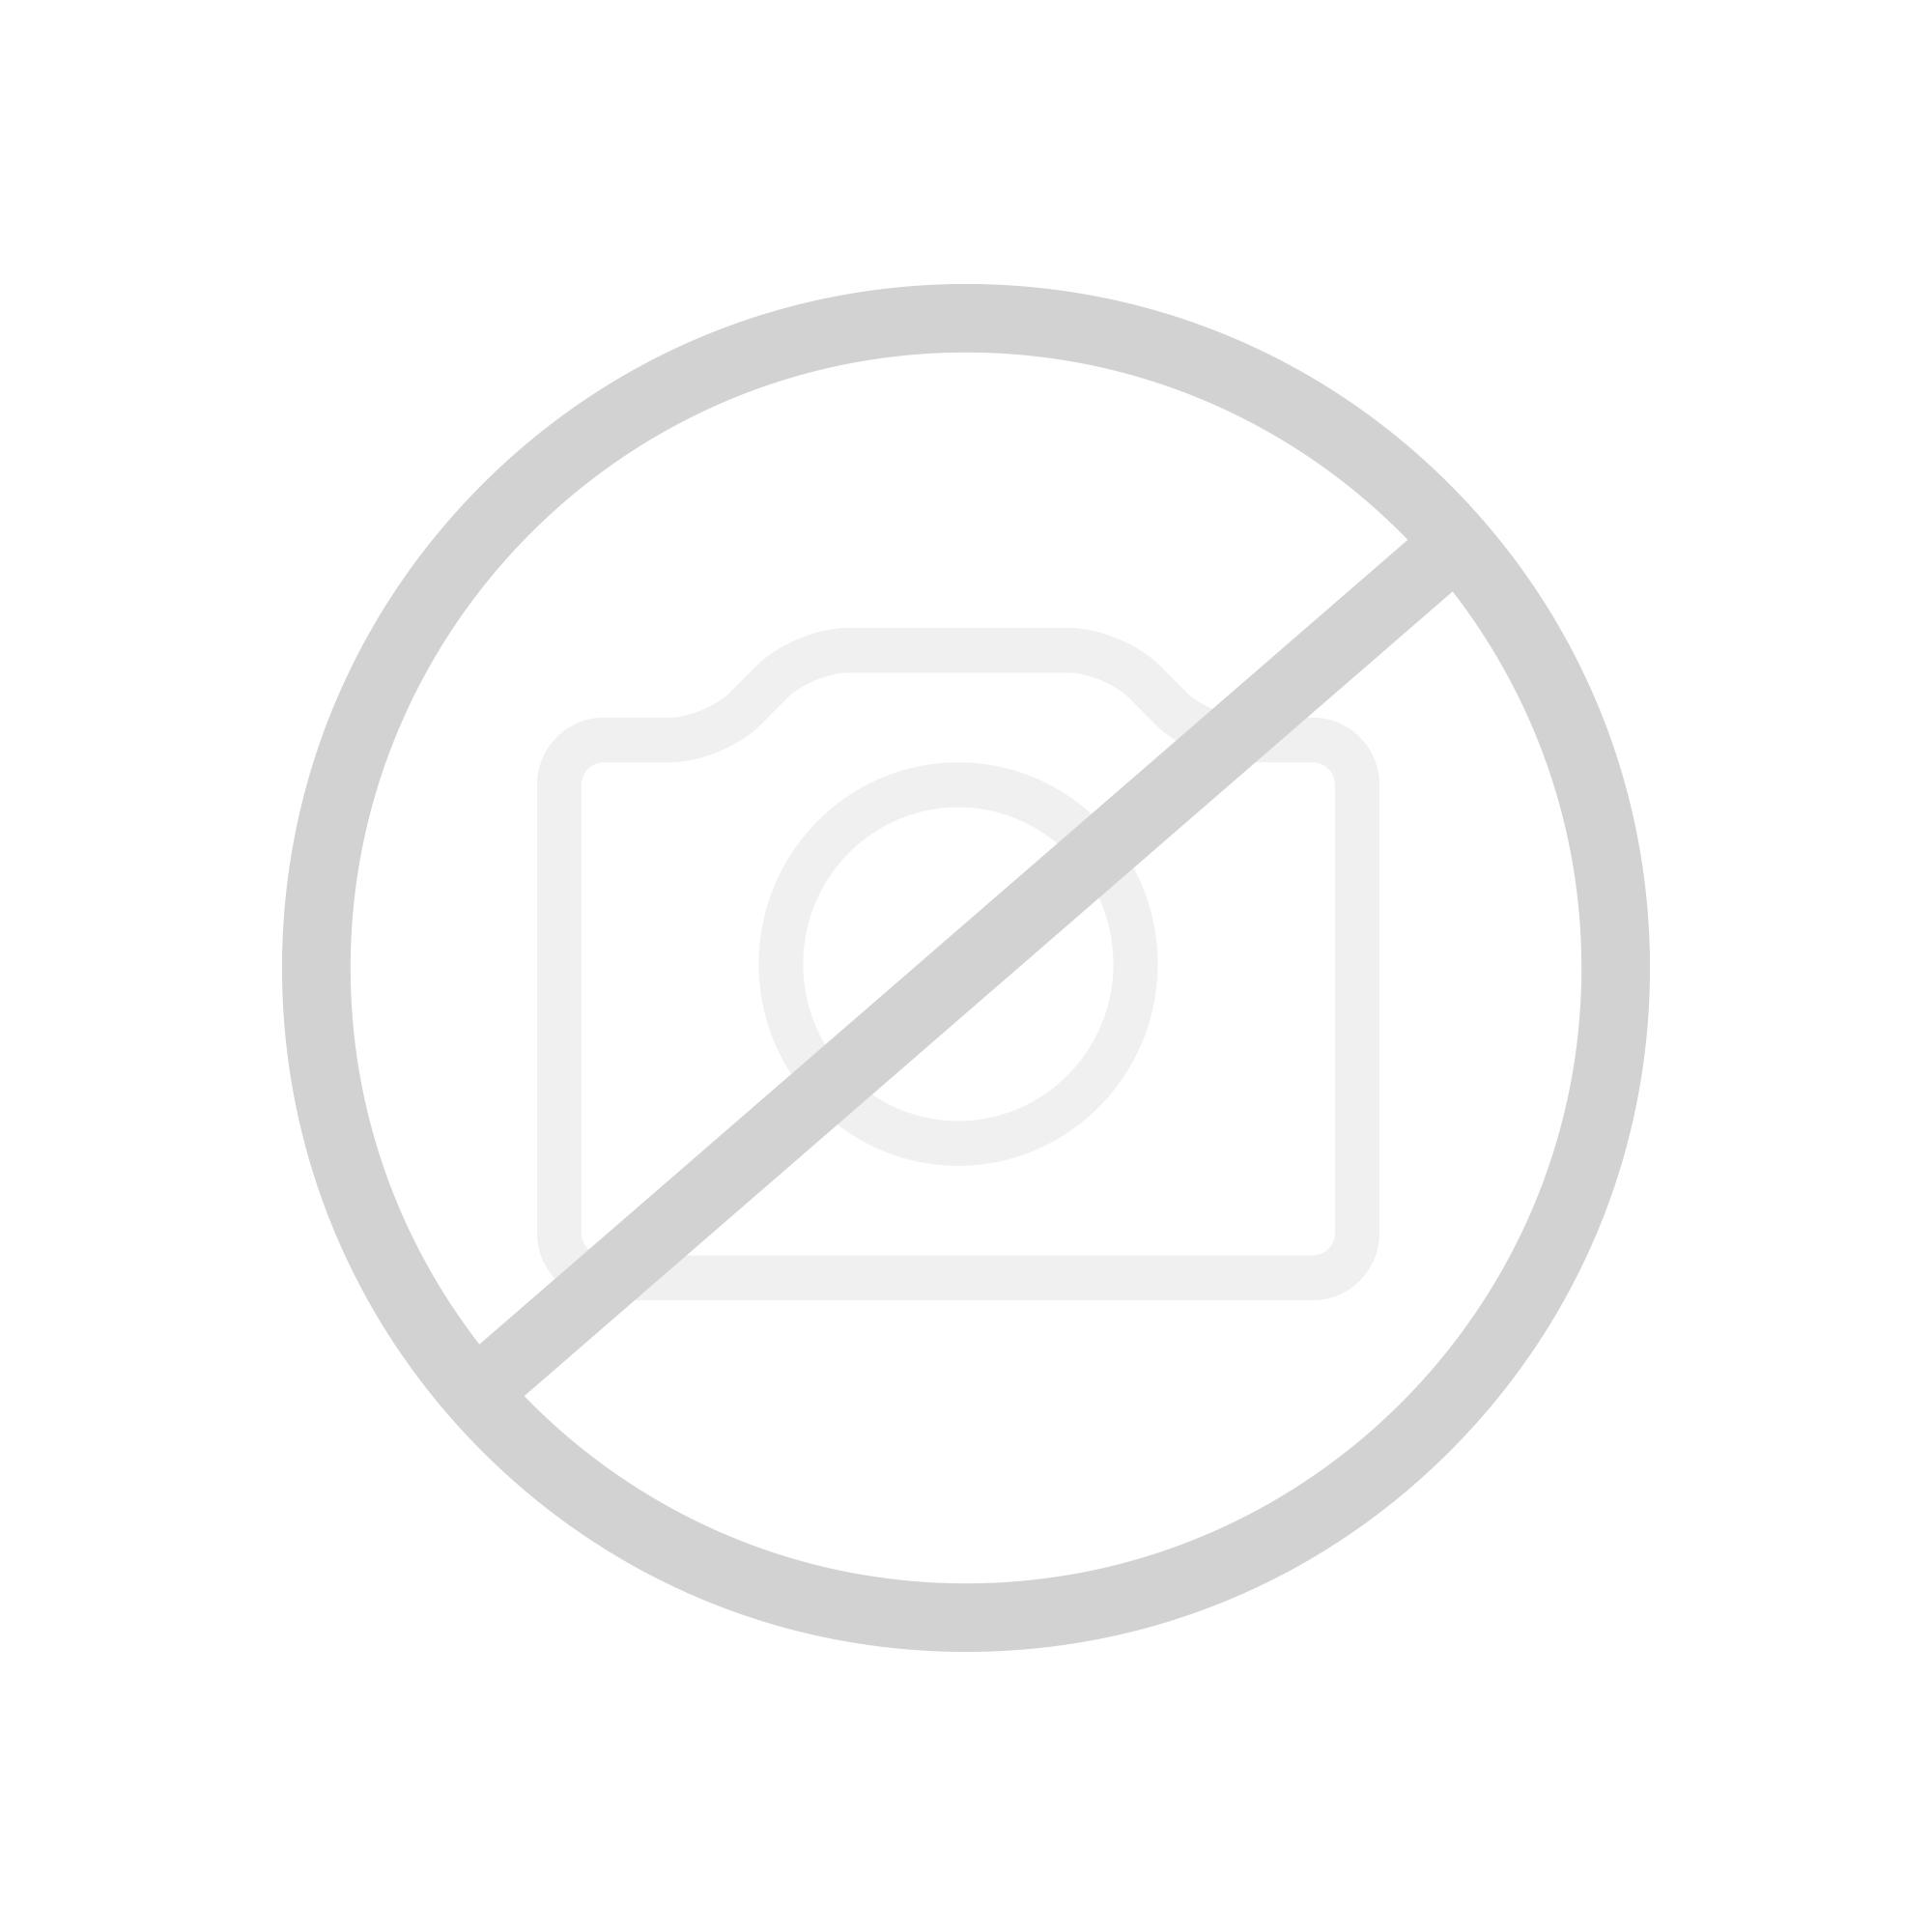 Hansgrohe Croma 220 Showerpipe Ecosmart Brausearm 400 mm schwenkbar, DN15